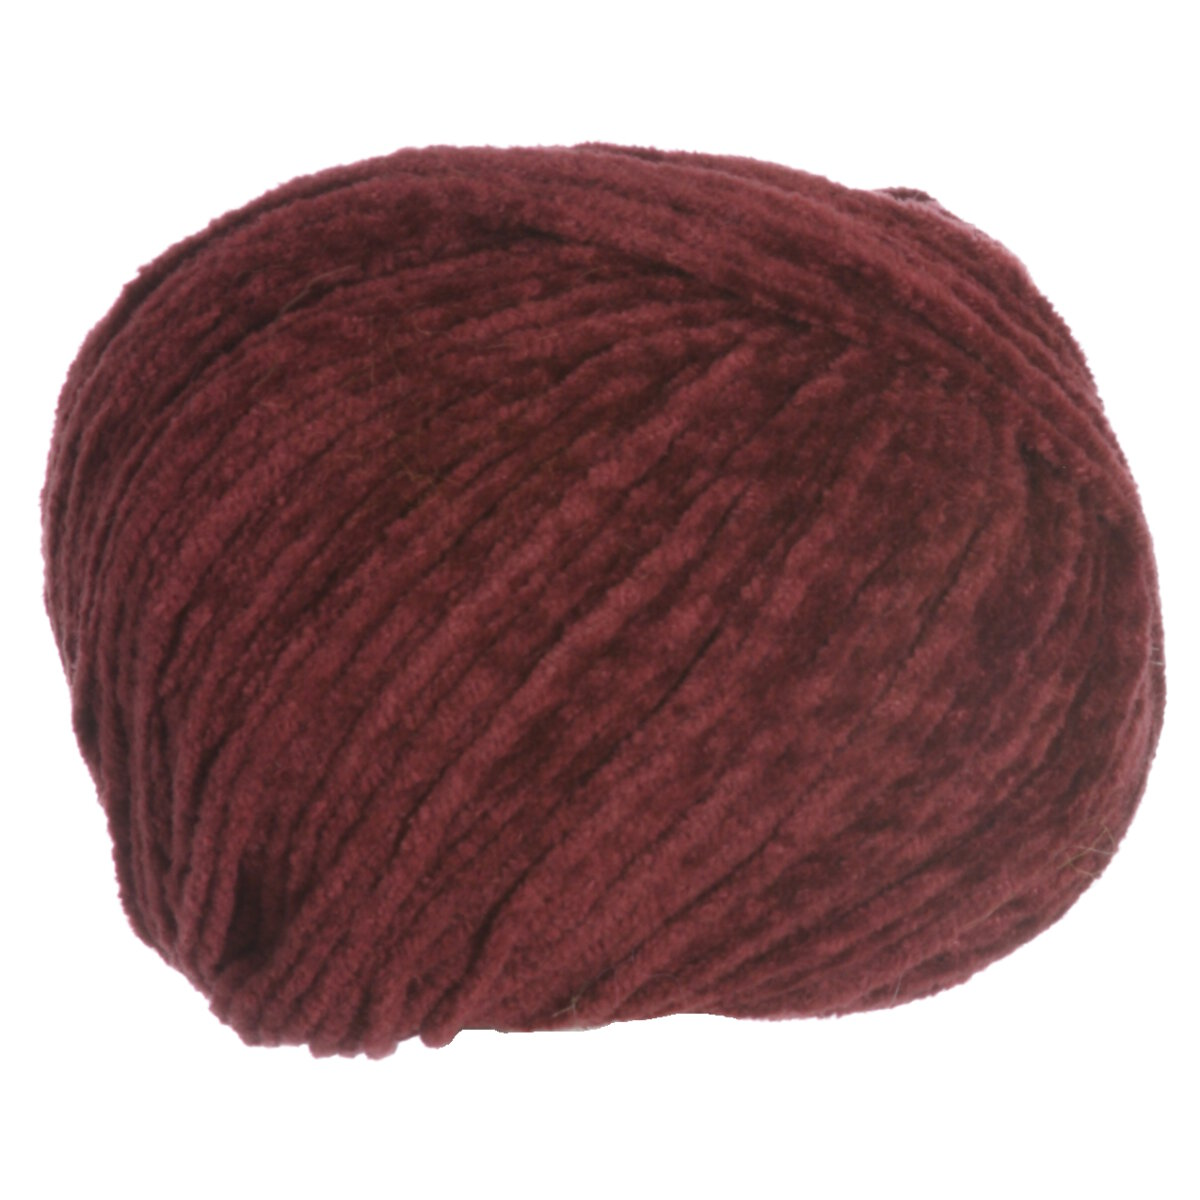 Chenille Yarn : Rowan Chenille Yarn - 755 Carafe at Jimmy Beans Wool